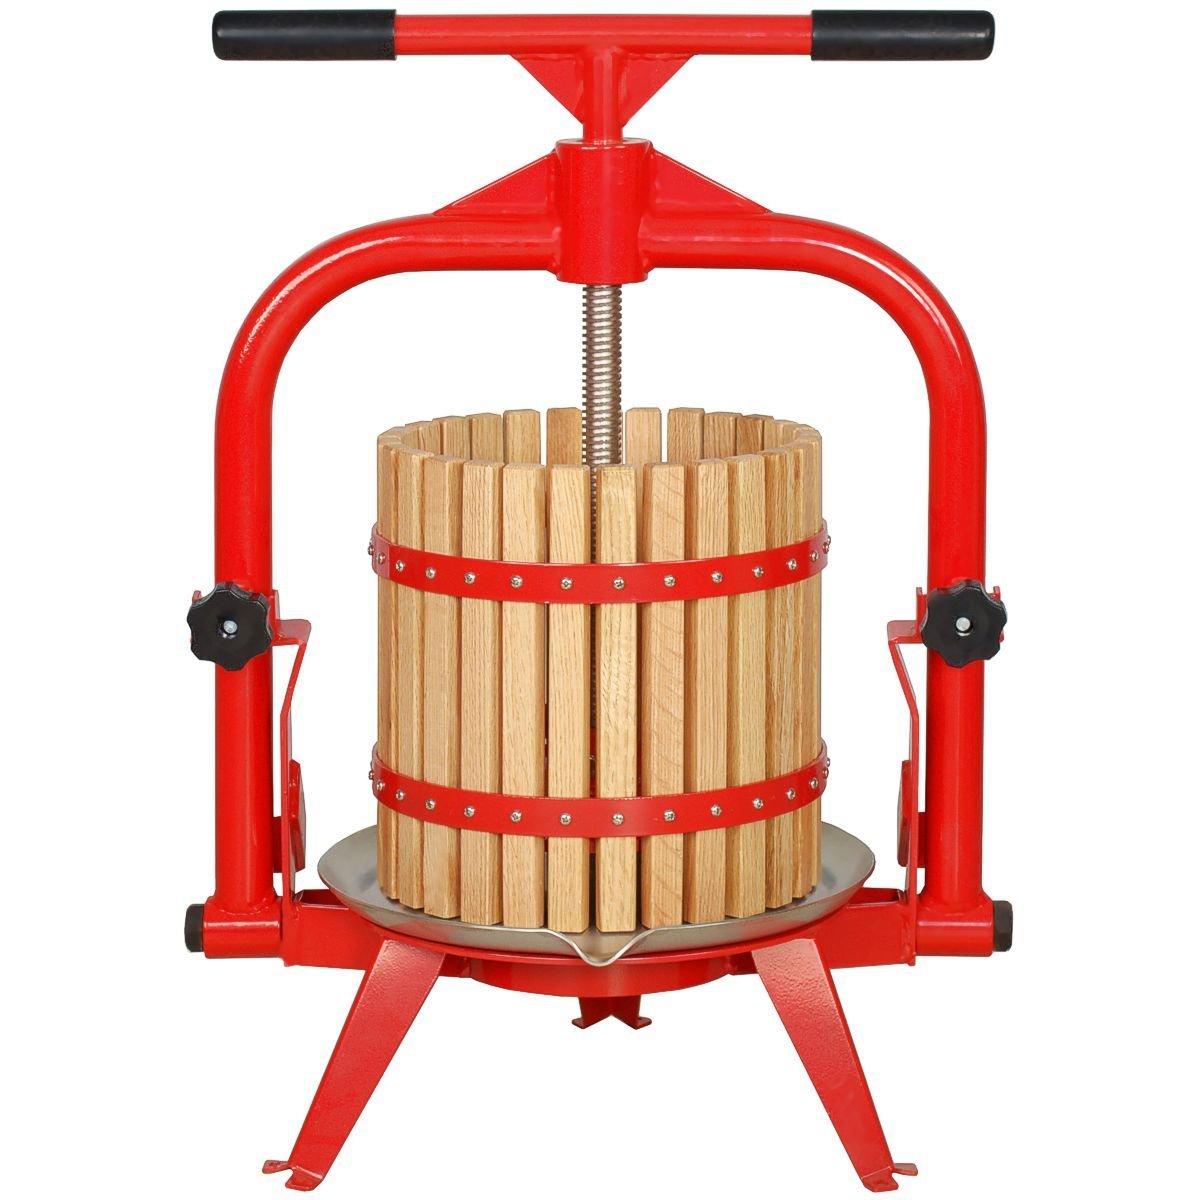 MacIntosh Fruit Press 4 Gallon + Wood Basket by Pleasant Hill Grain